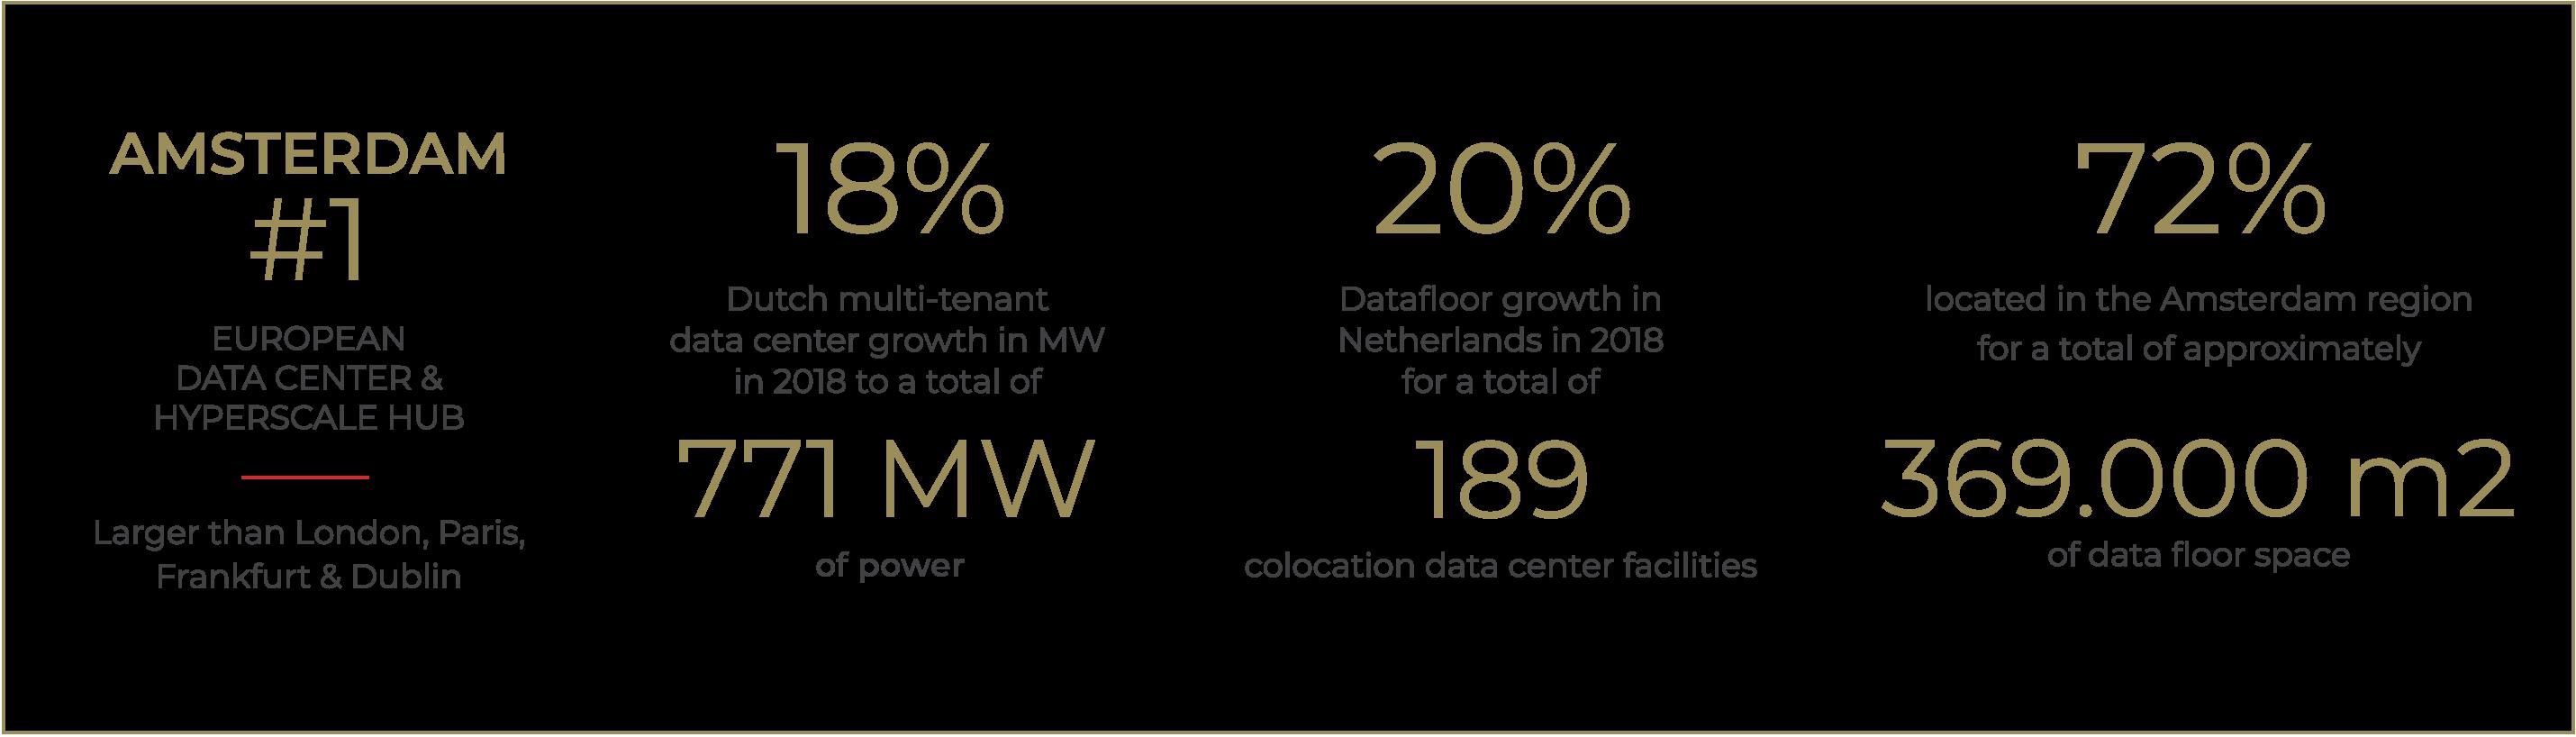 Amsterdam-Data-Center-stats